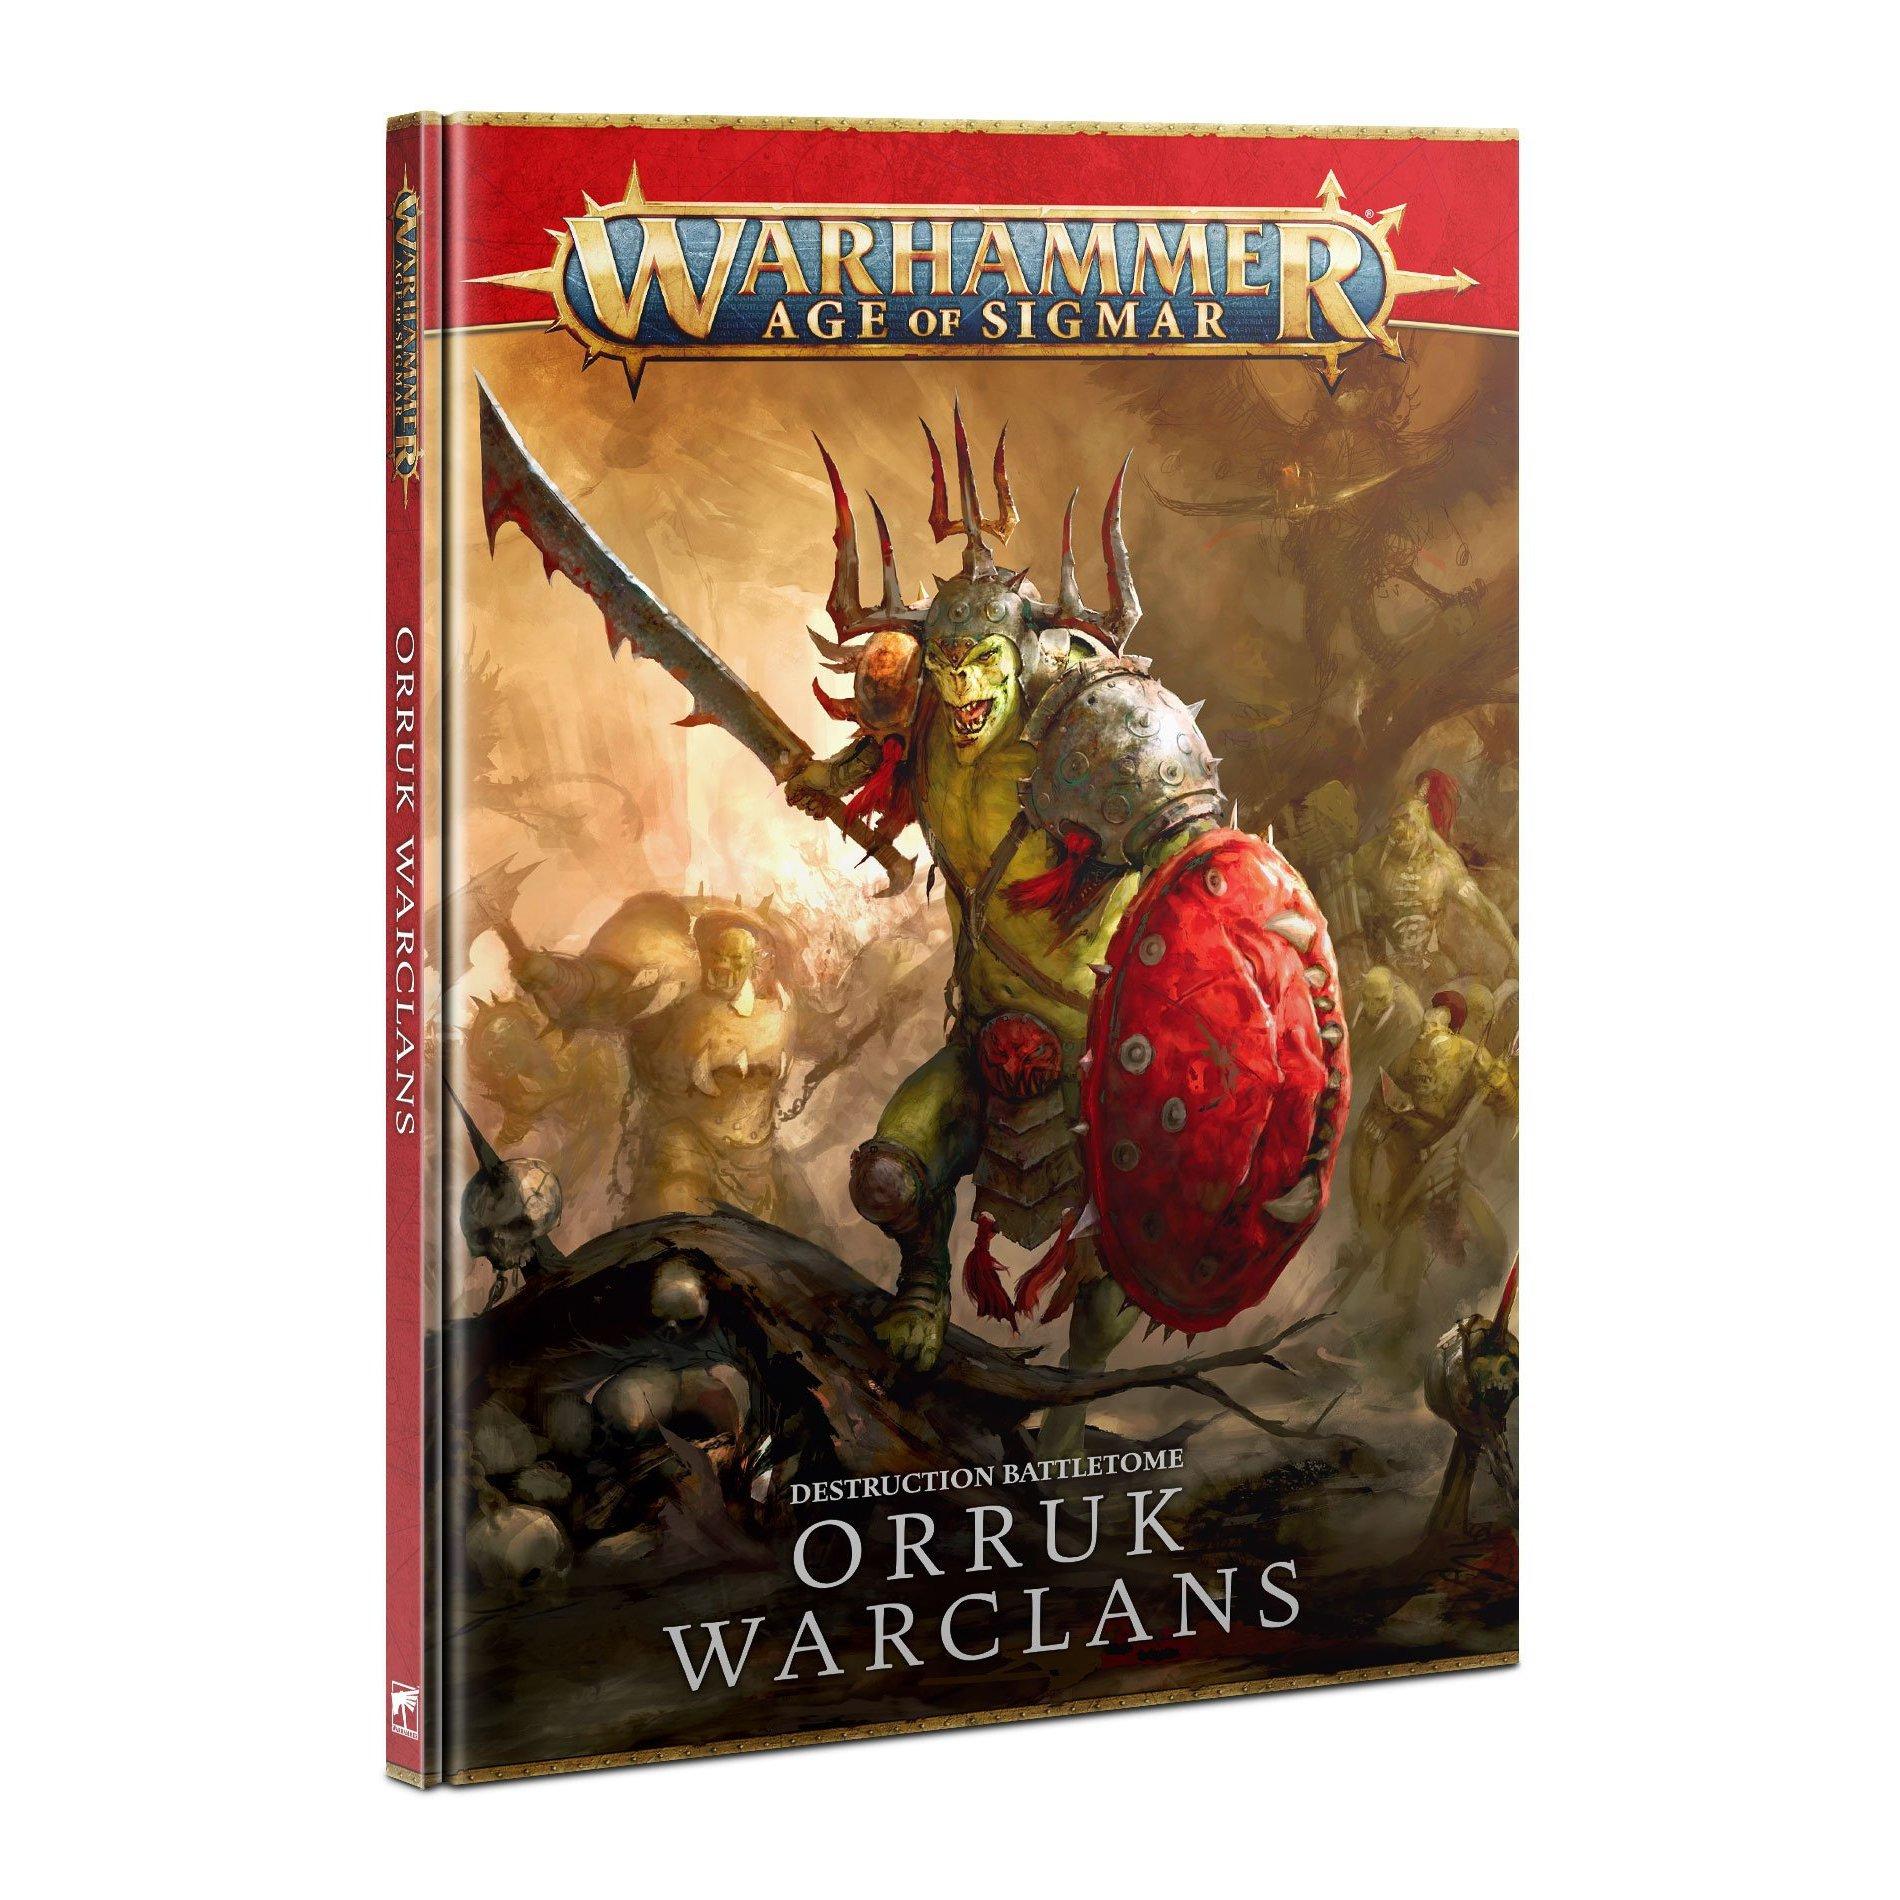 Kniha Warhammer Age of Sigmar: Battletome Orruk Warclans (2021)